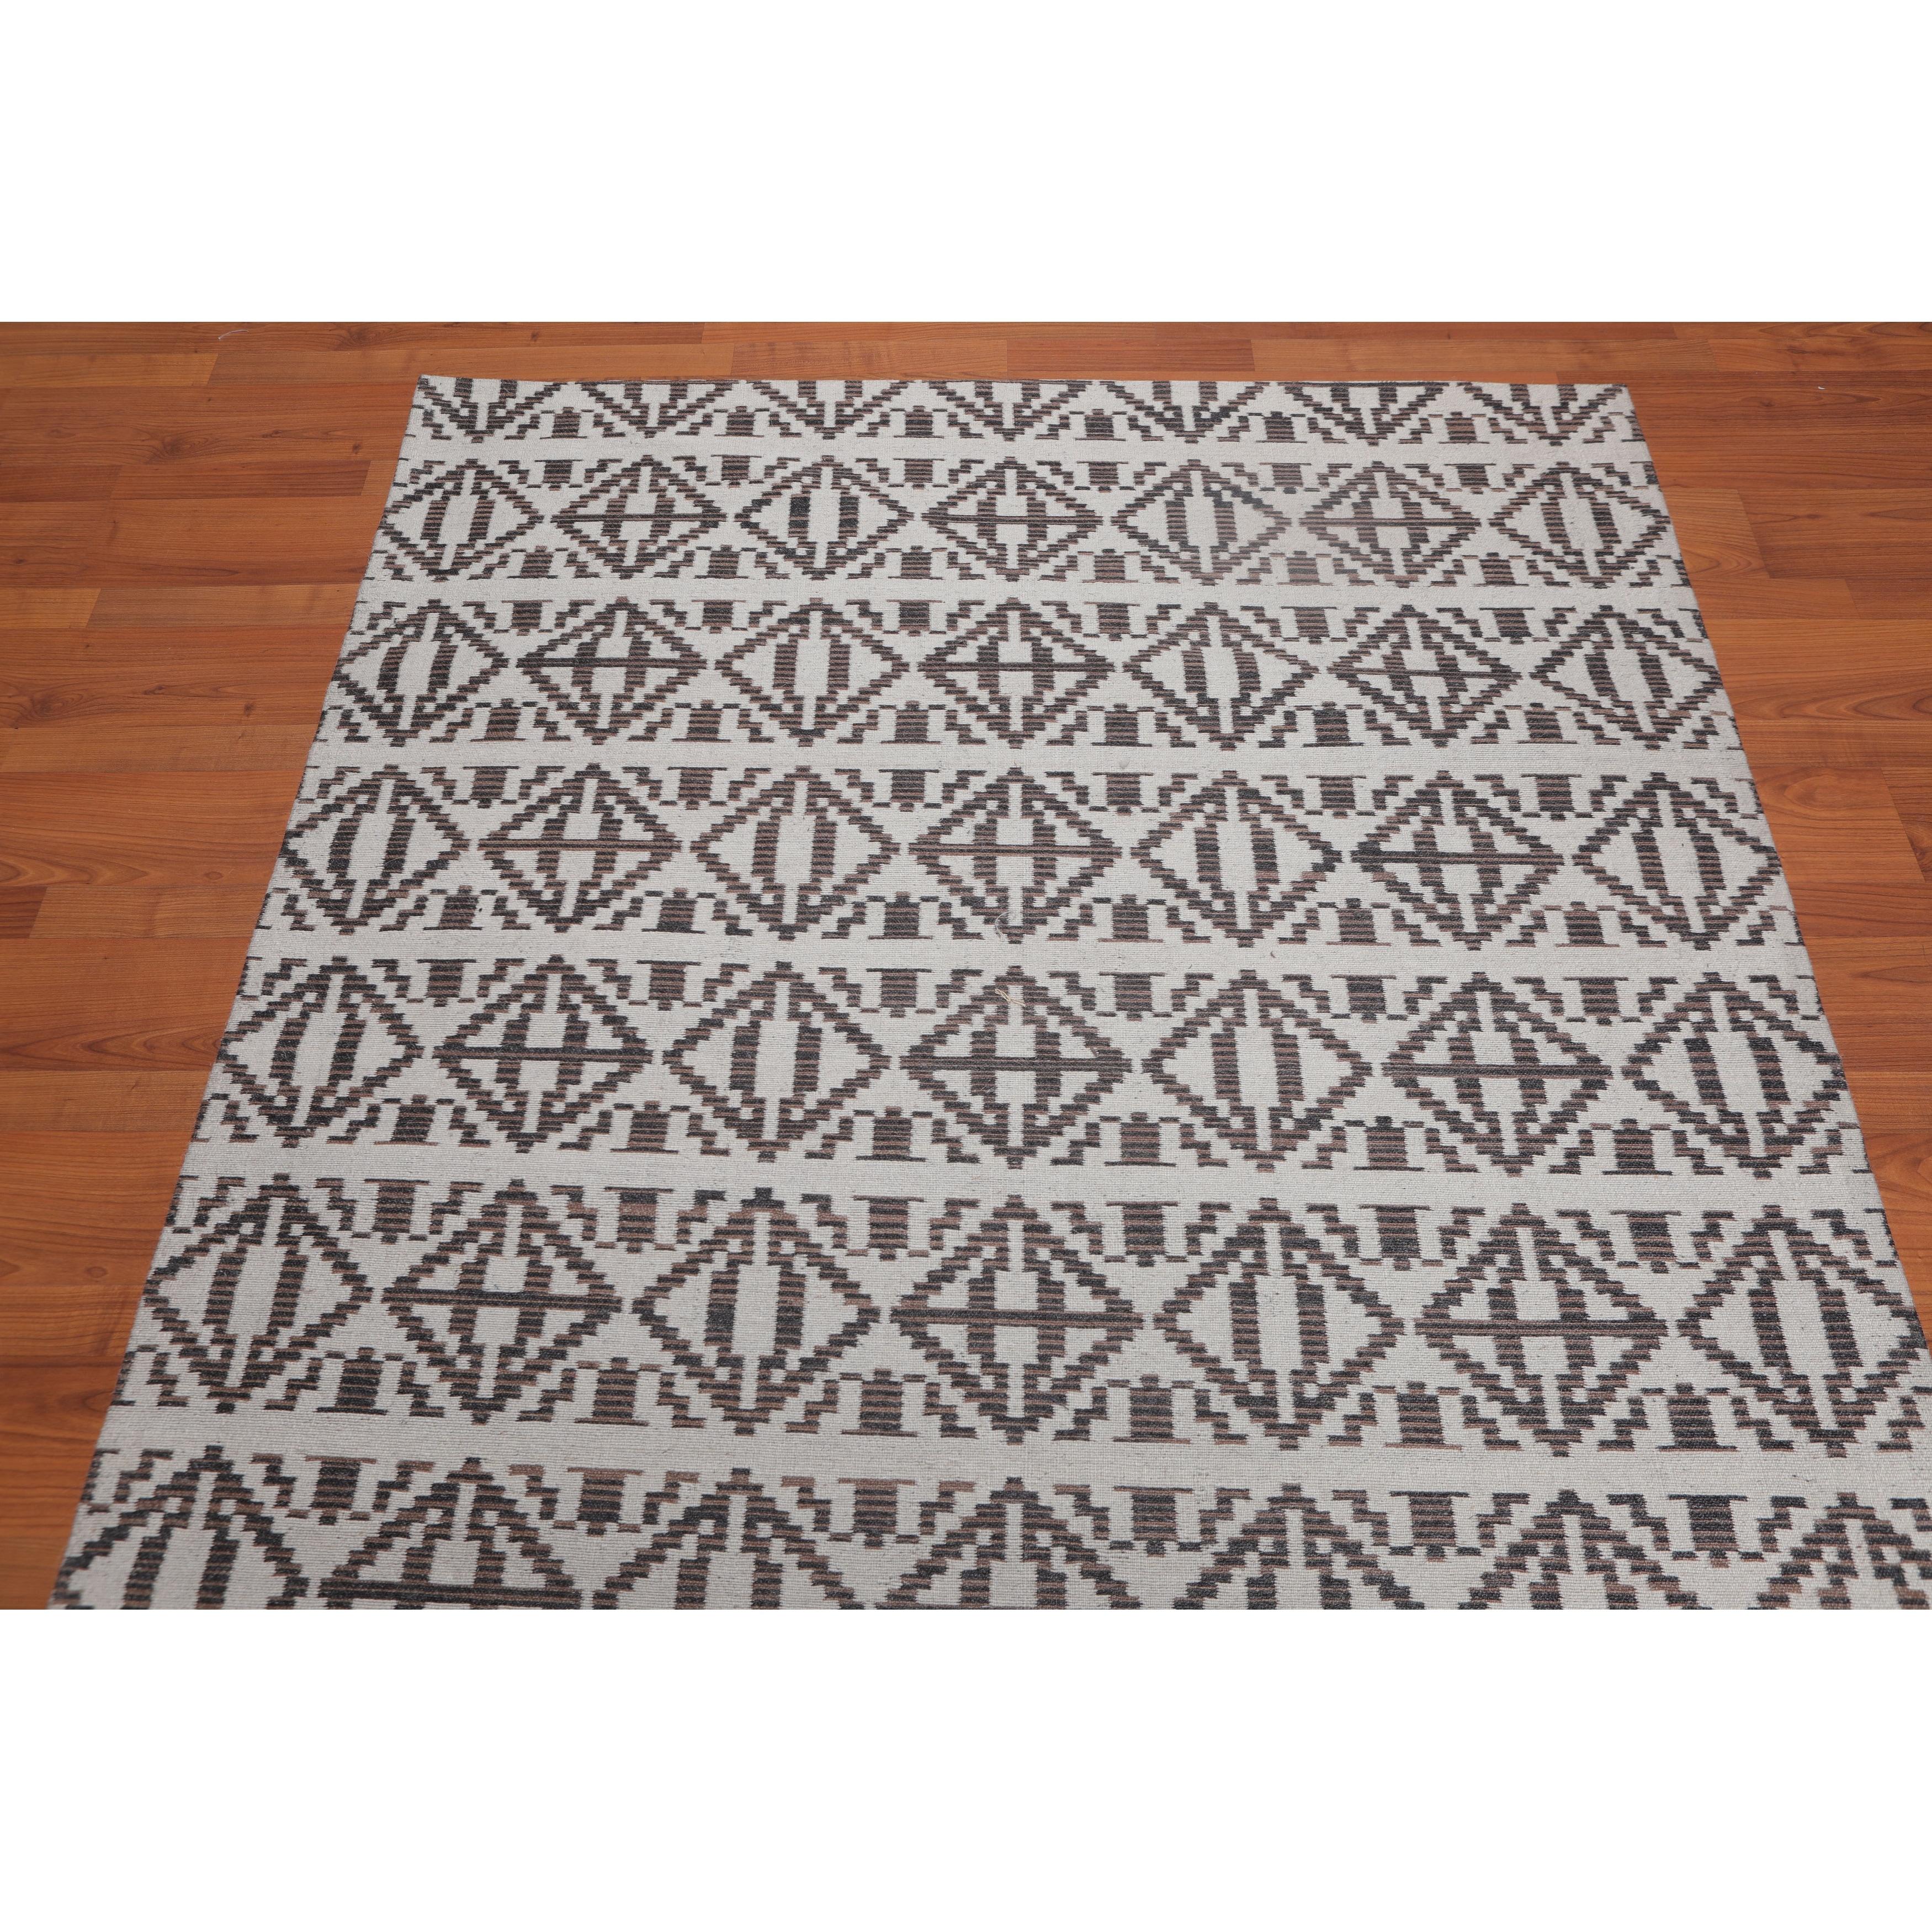 Hand Made Beige Brown Flatweave Wool Modern Contemporary Oriental Area Rug 5x7 5 X 8 On Sale Overstock 31523654